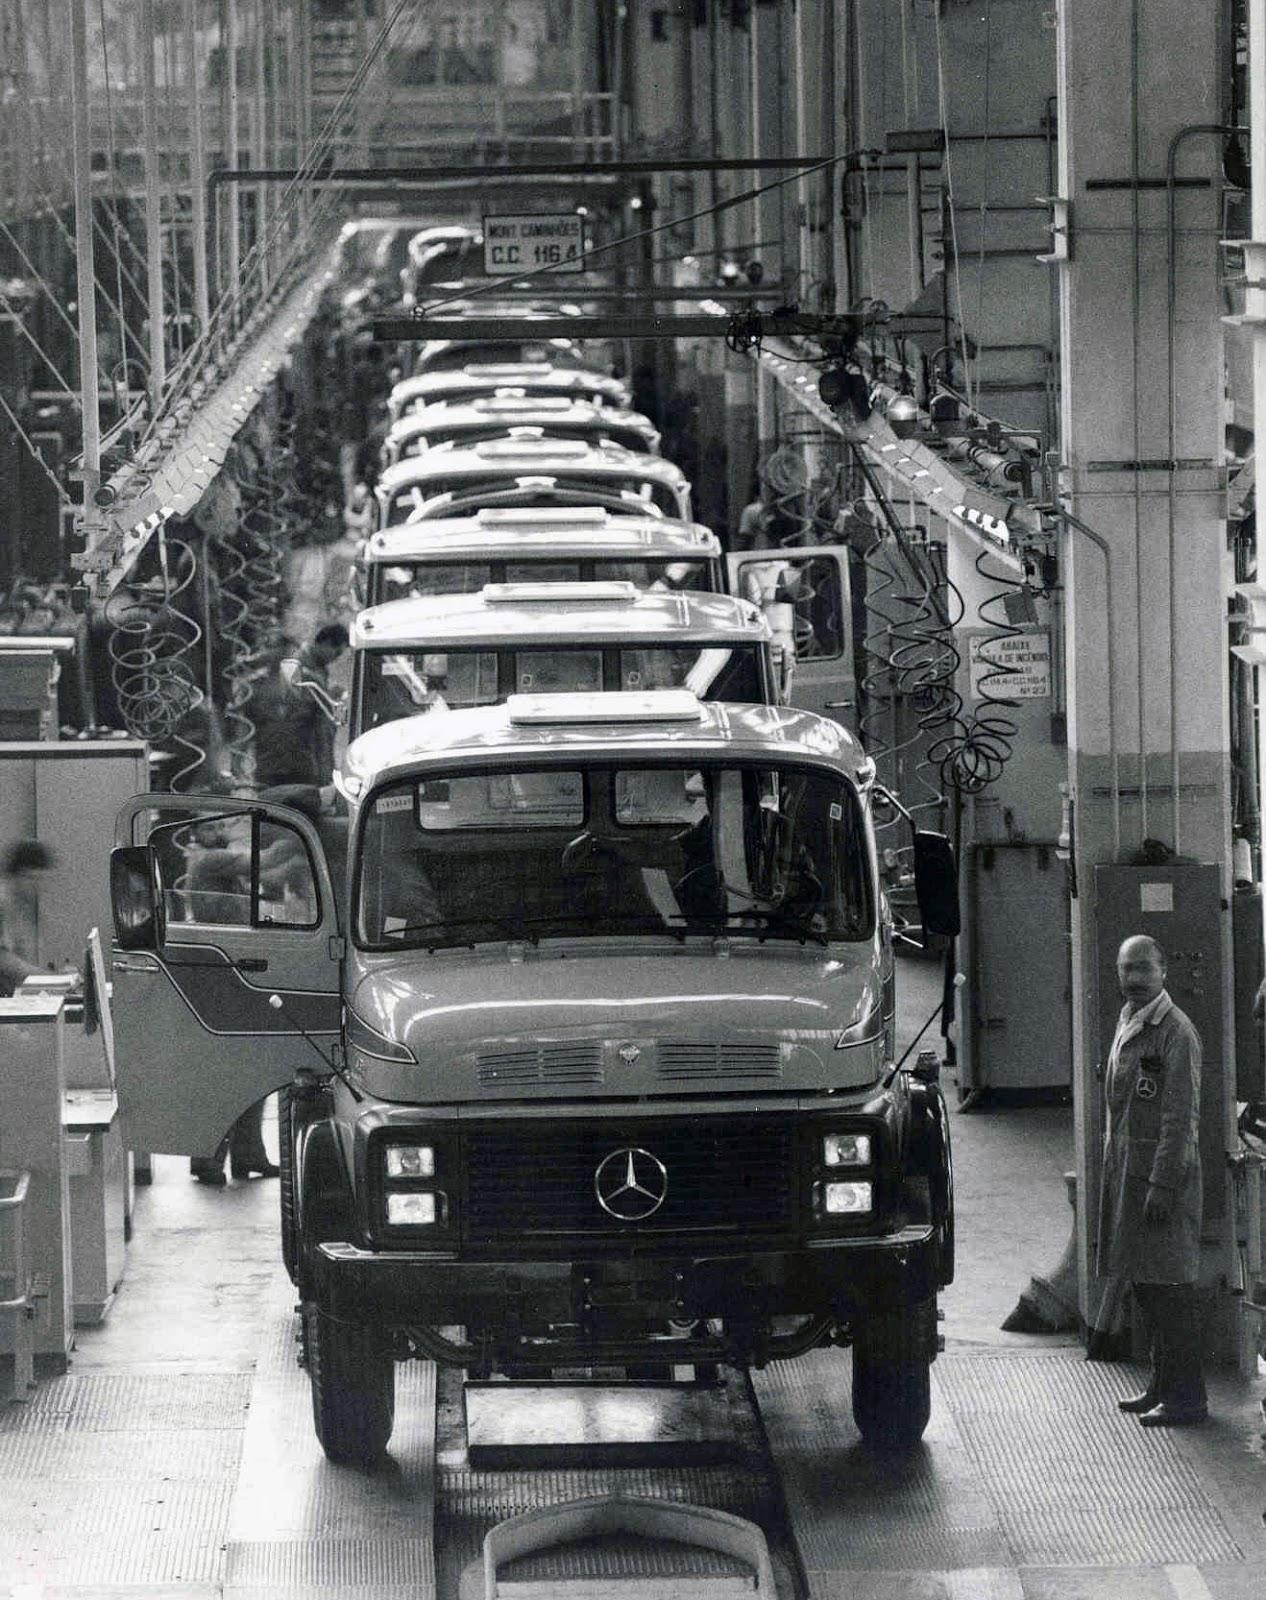 Automotivz f bricas mercedes benz caminh es s rie l for Mercedes benz 80s